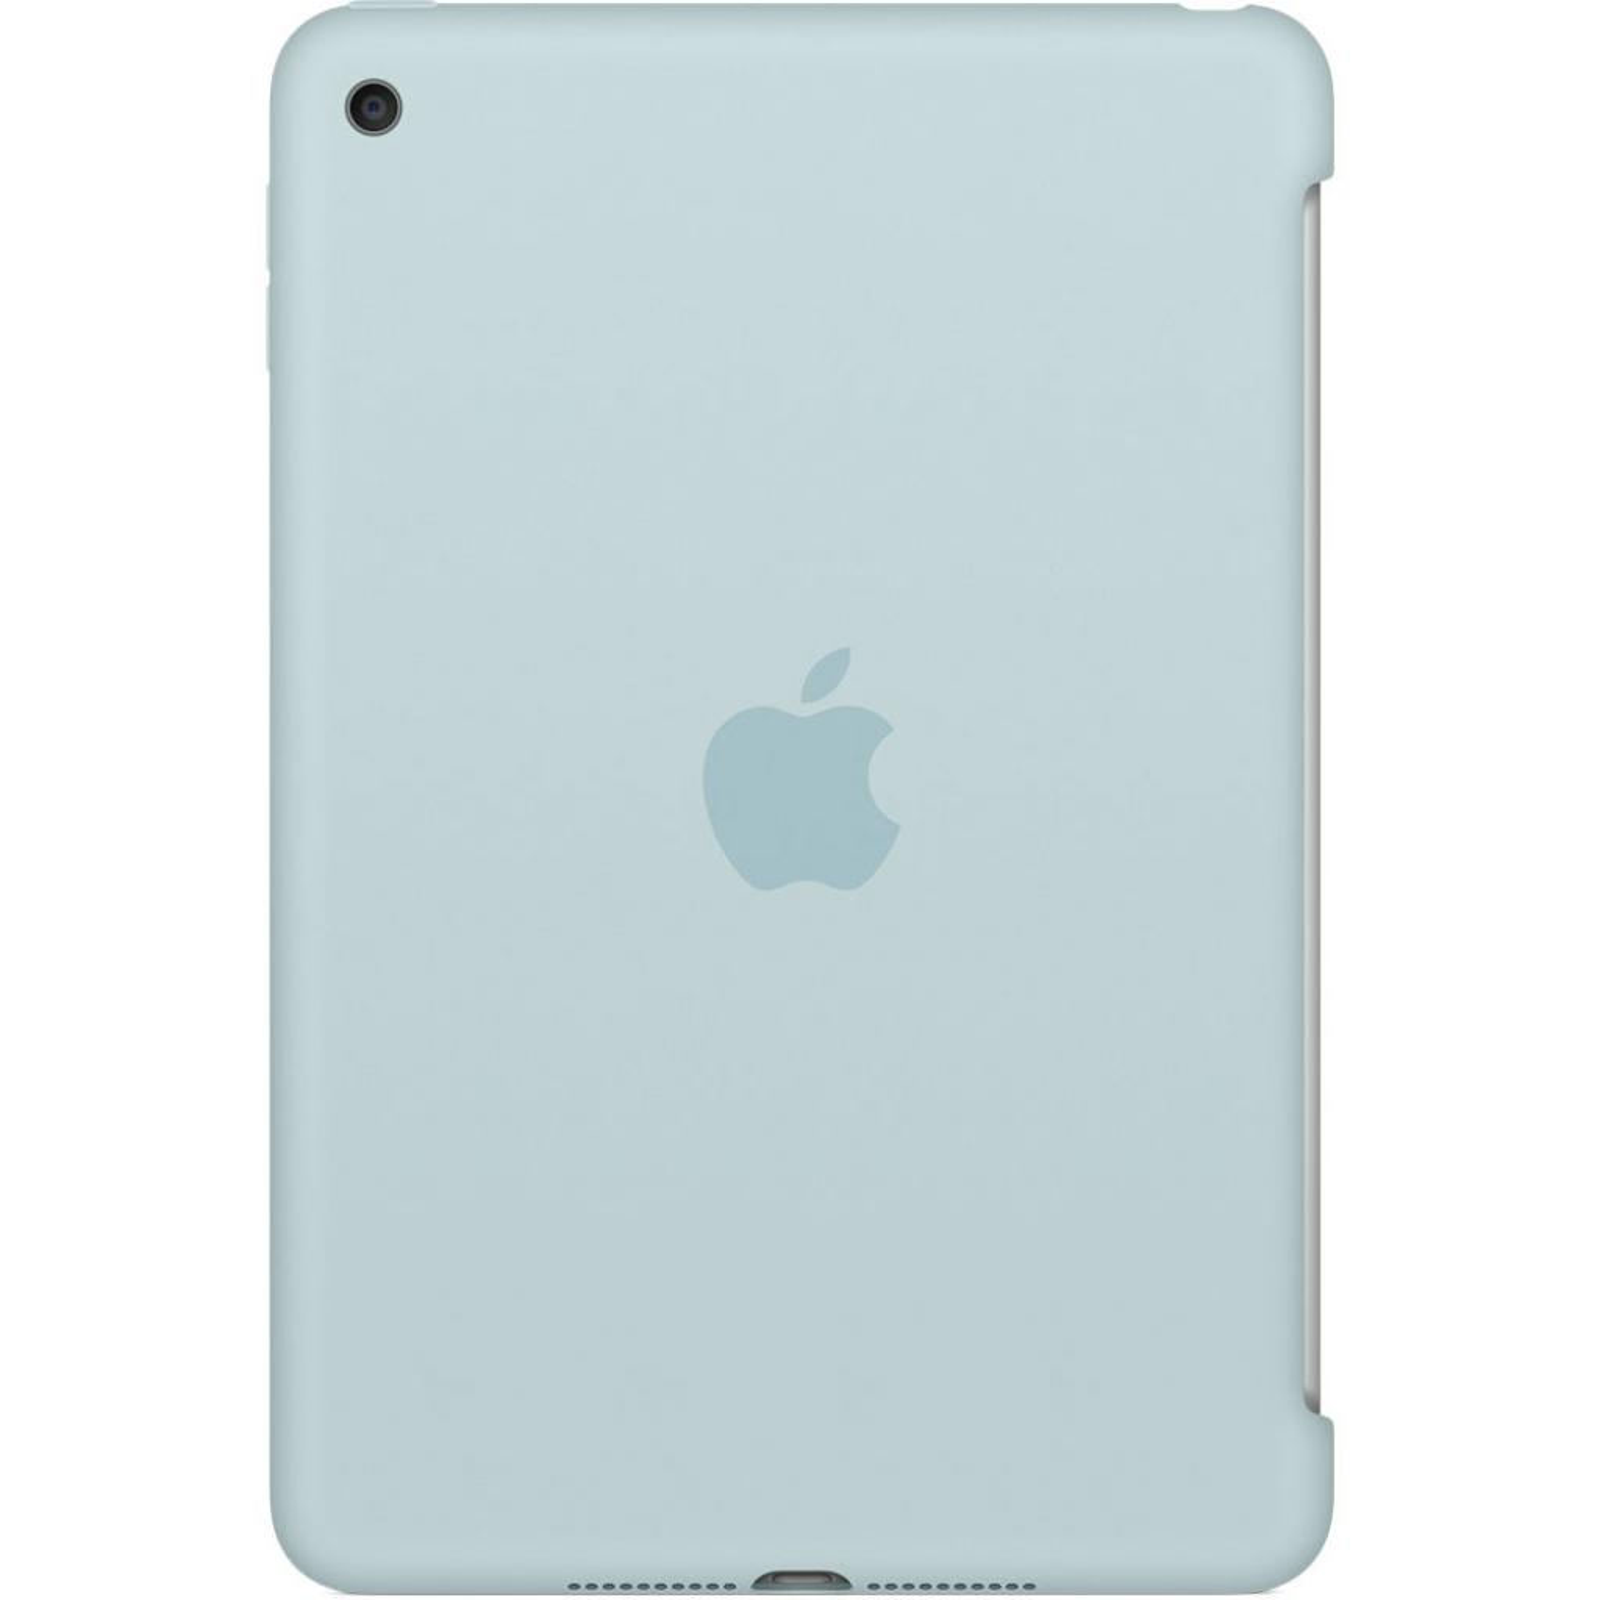 Чехол для планшета Apple iPad mini 4 Turquoise (MLD72ZM/A)